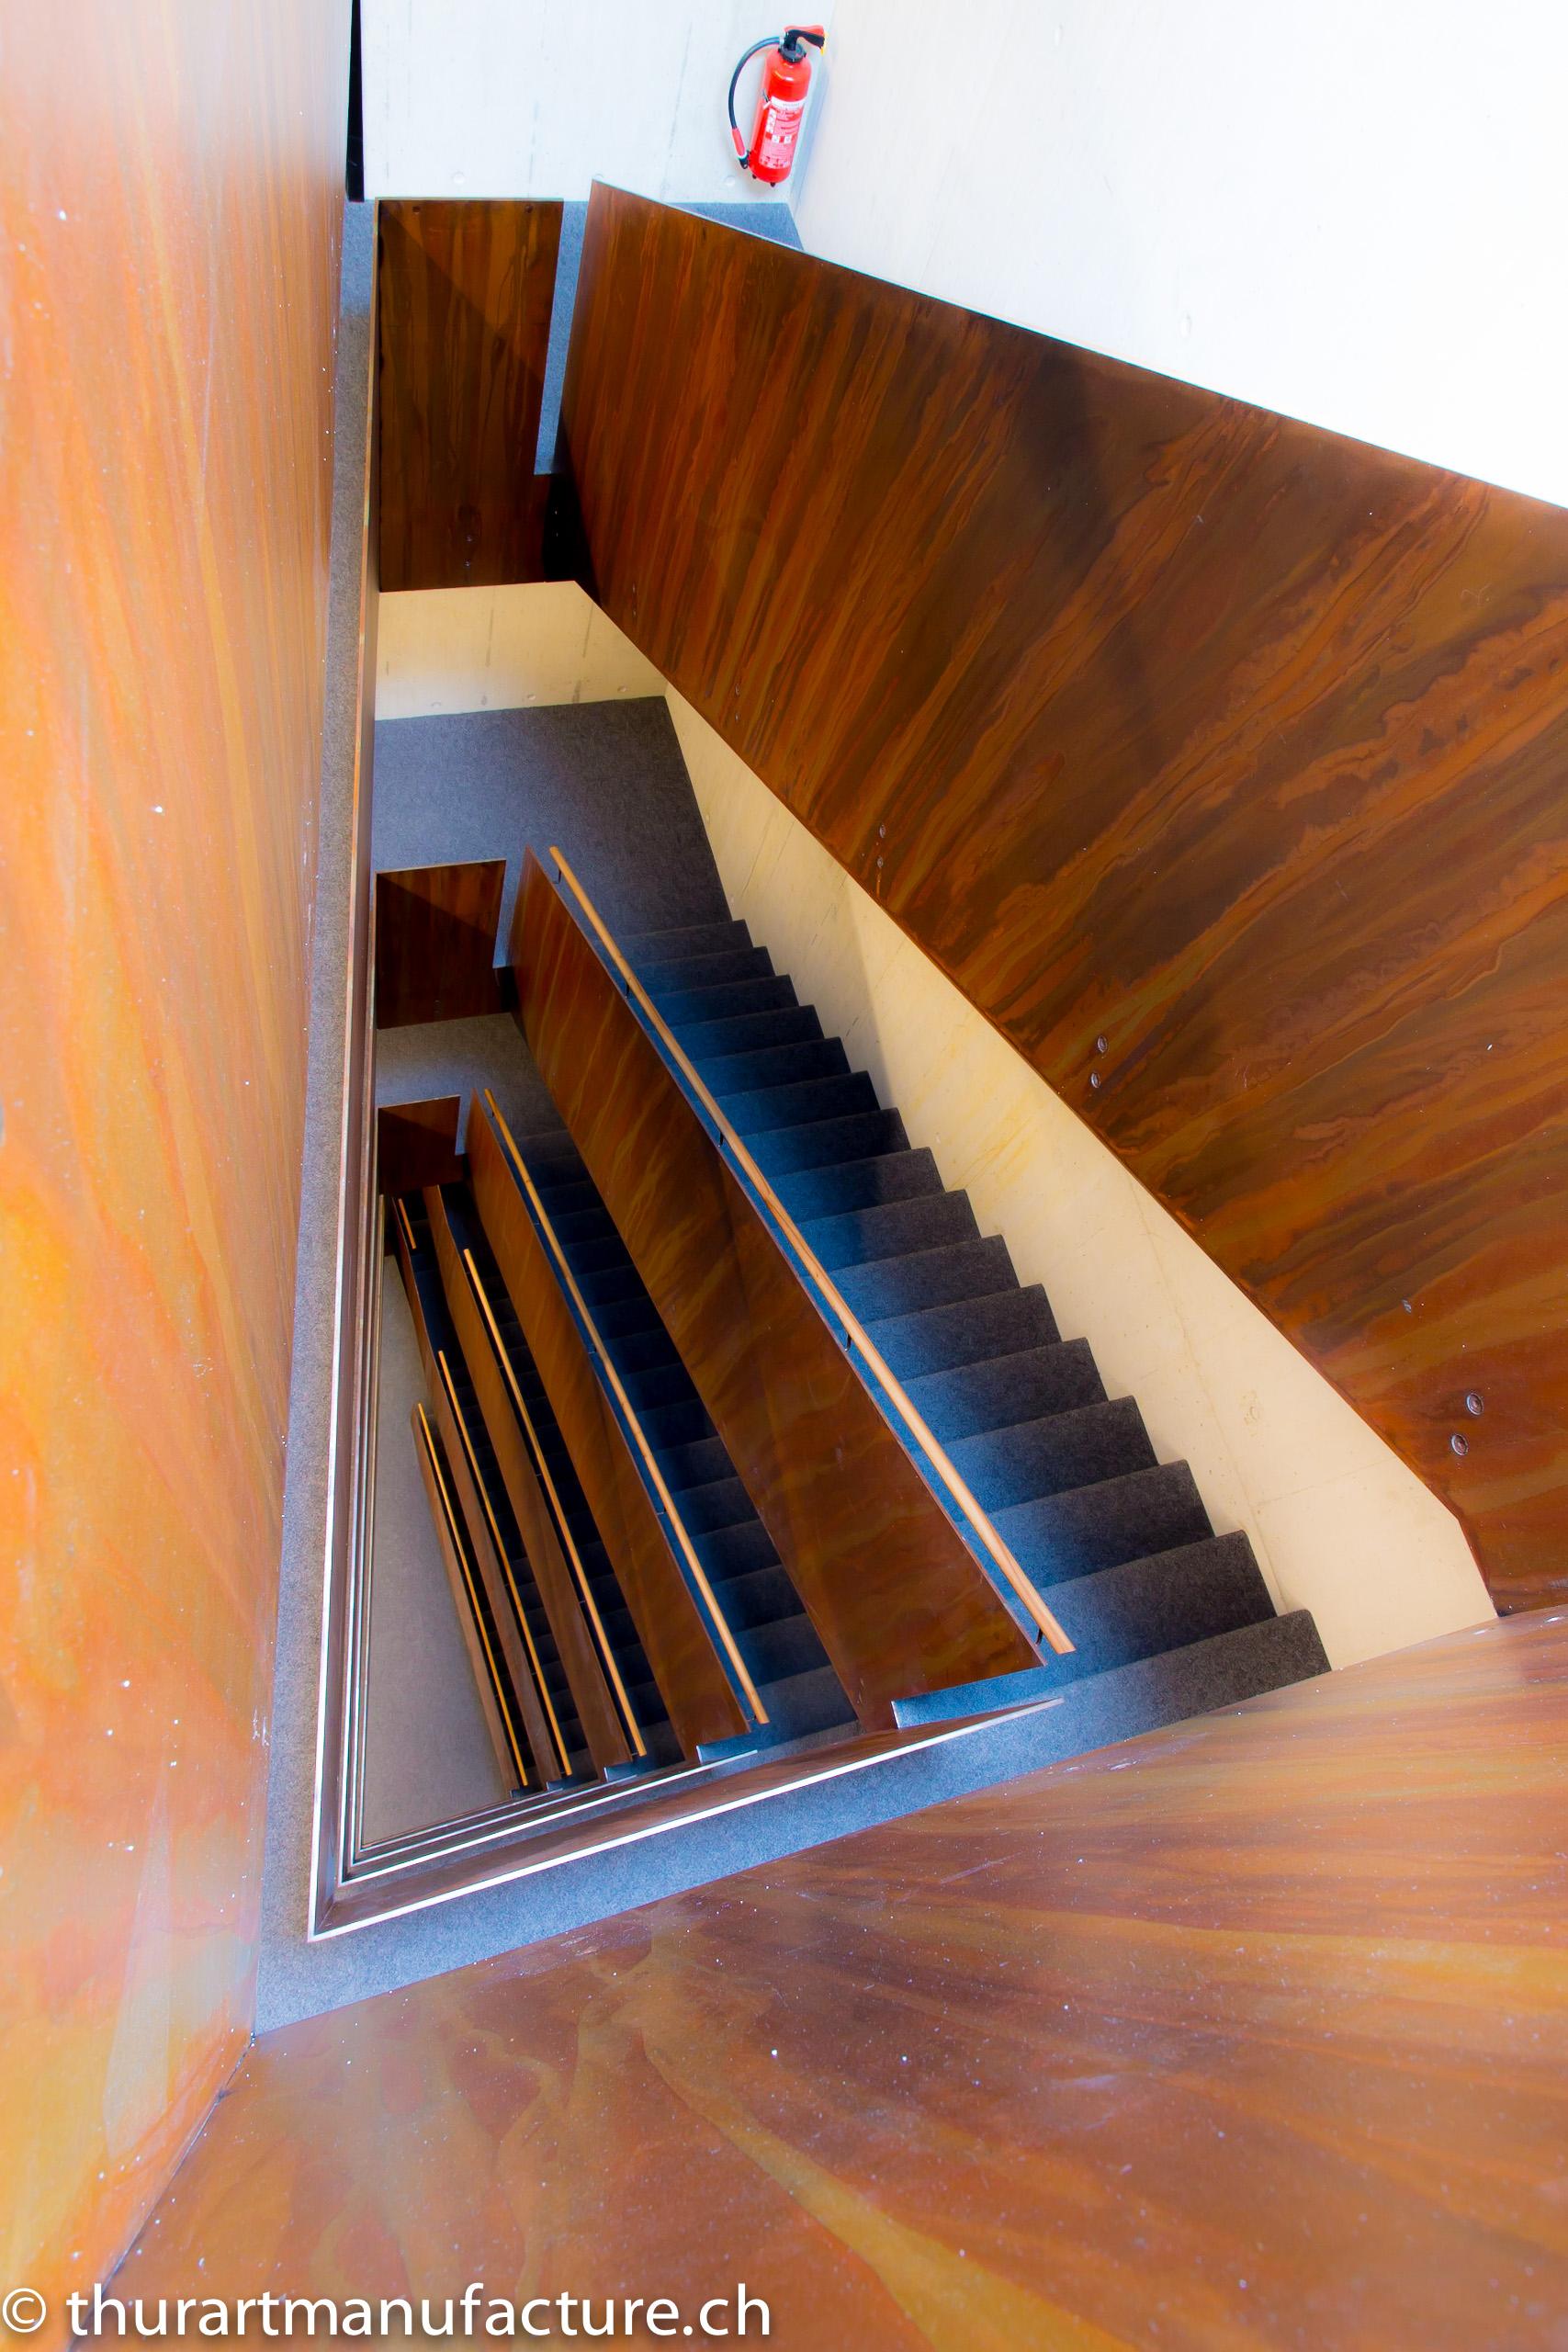 Treppengeländer im Merkurhof Rapperswil-Jona, 750 m2